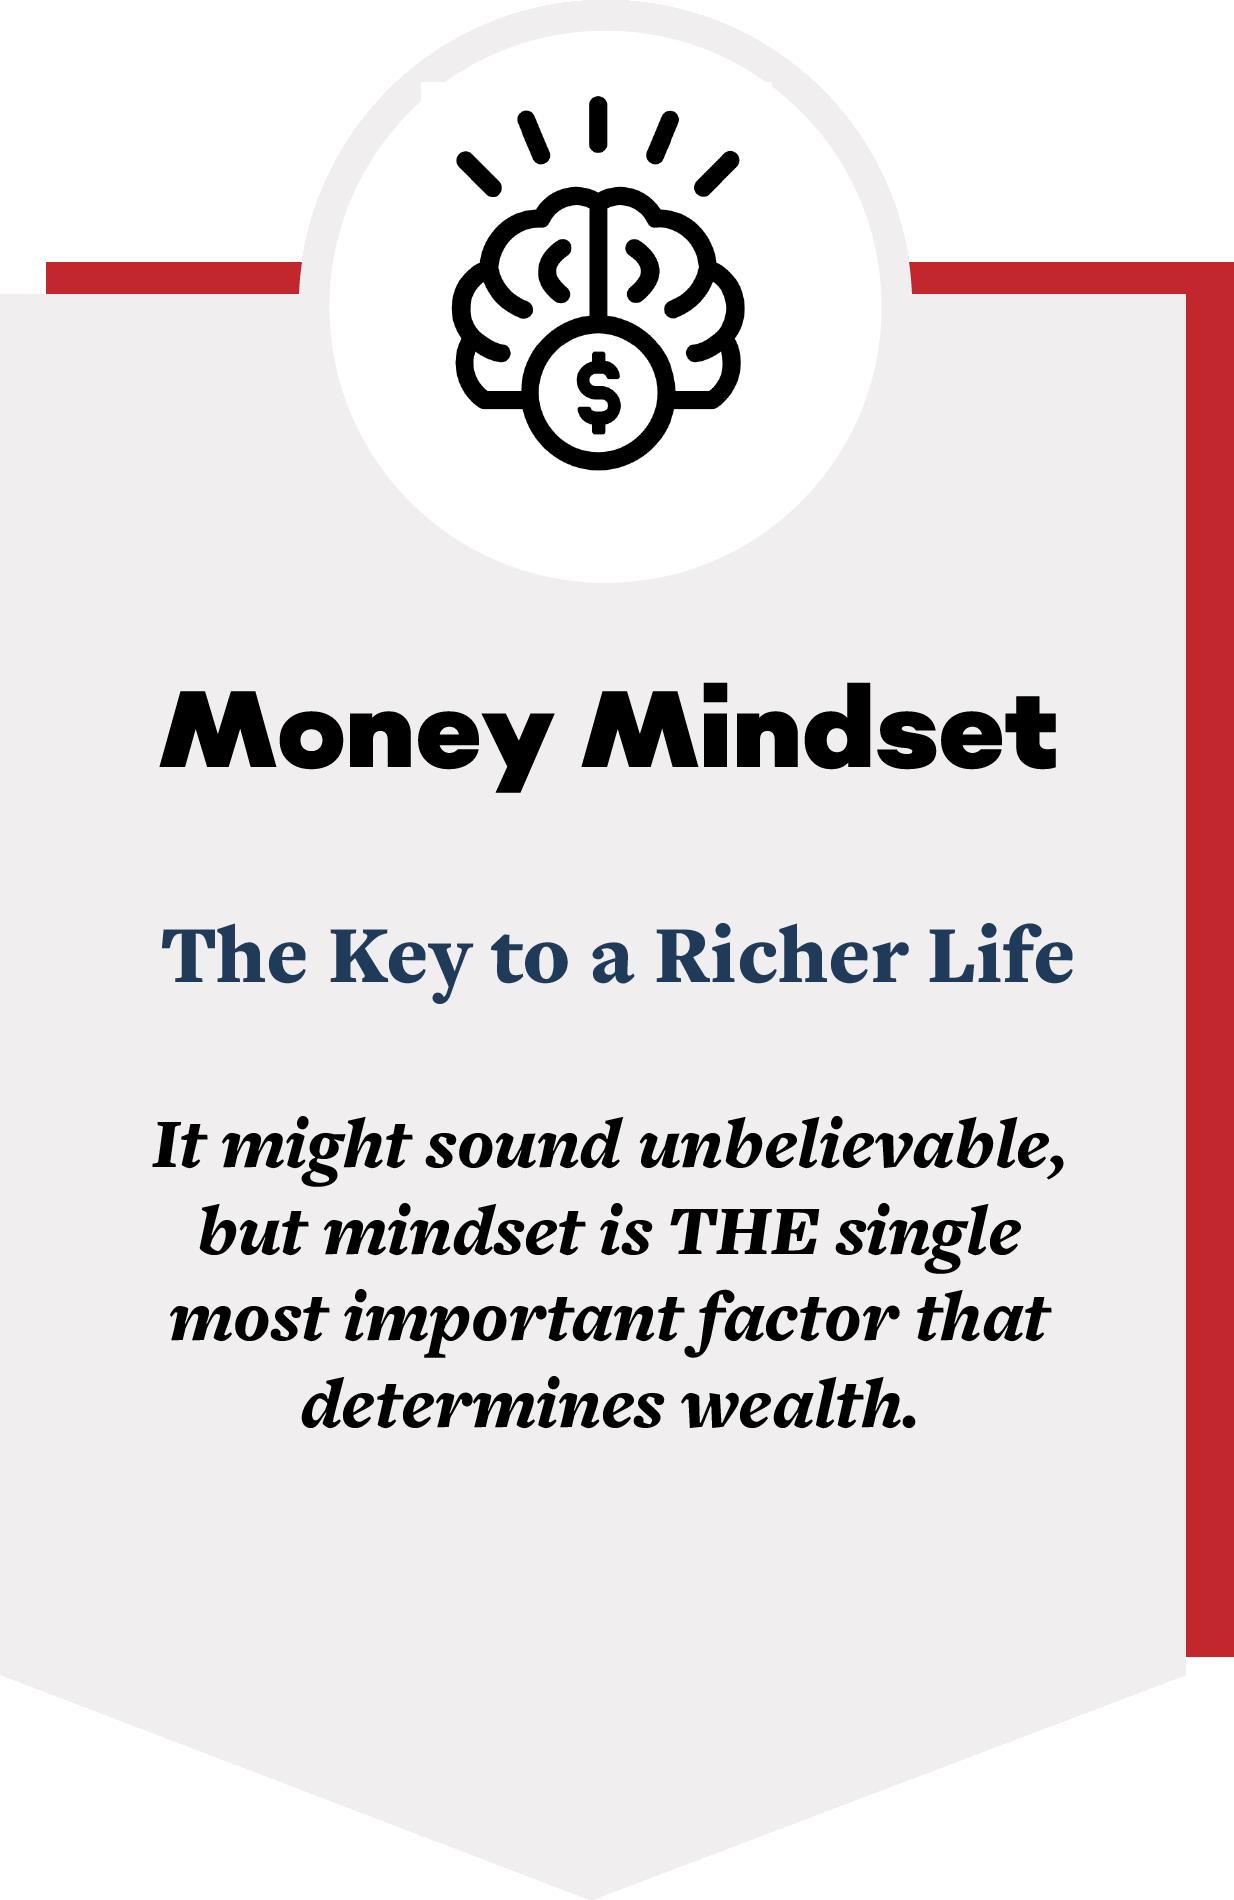 Invite Obu Ramaraj to speak on Money Mindset - The key to richer life